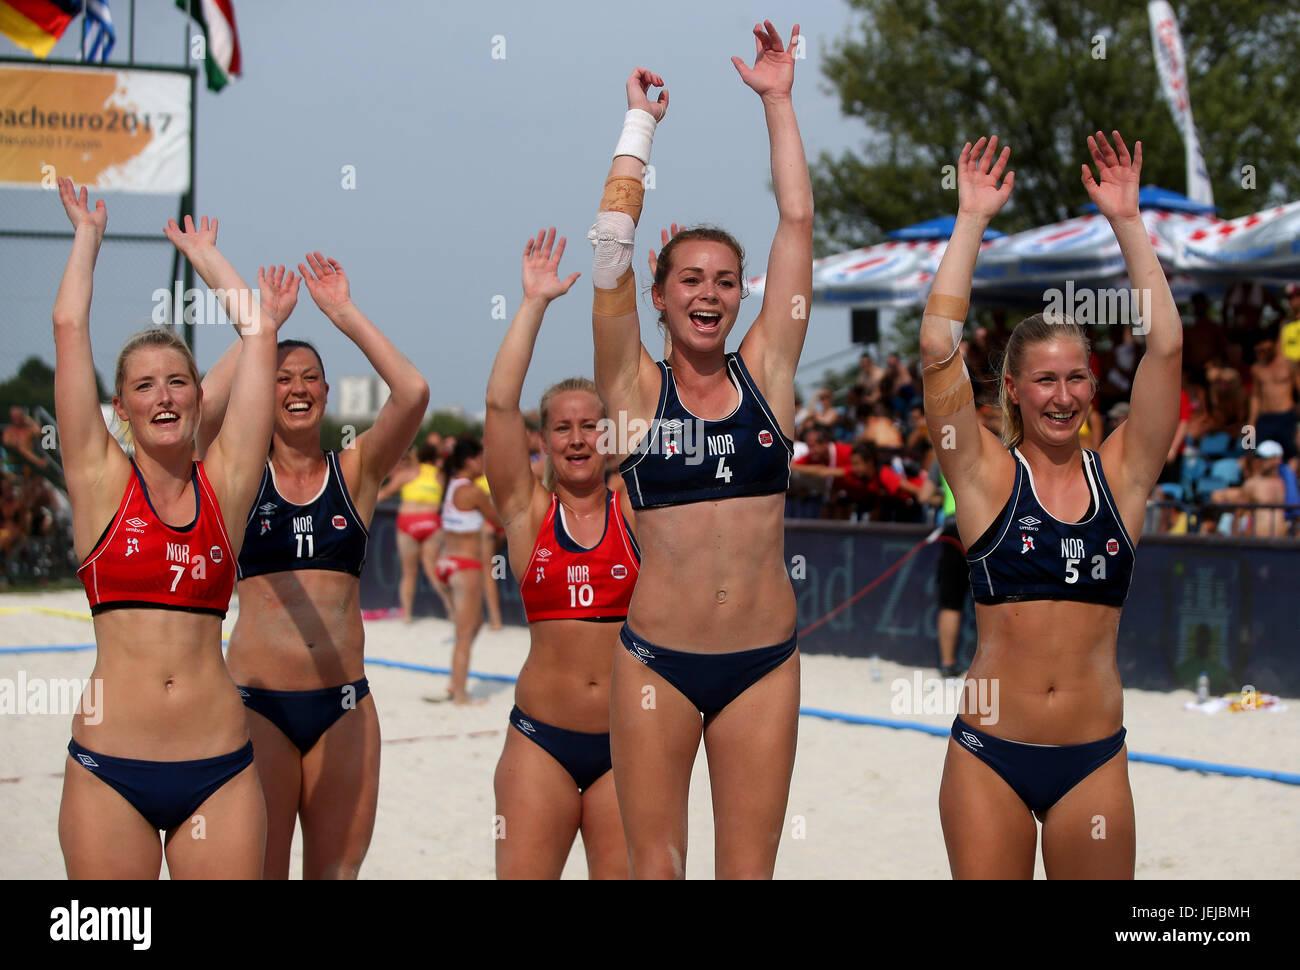 zagreb croatia 25th june 2017 norwegian women s team celebrate